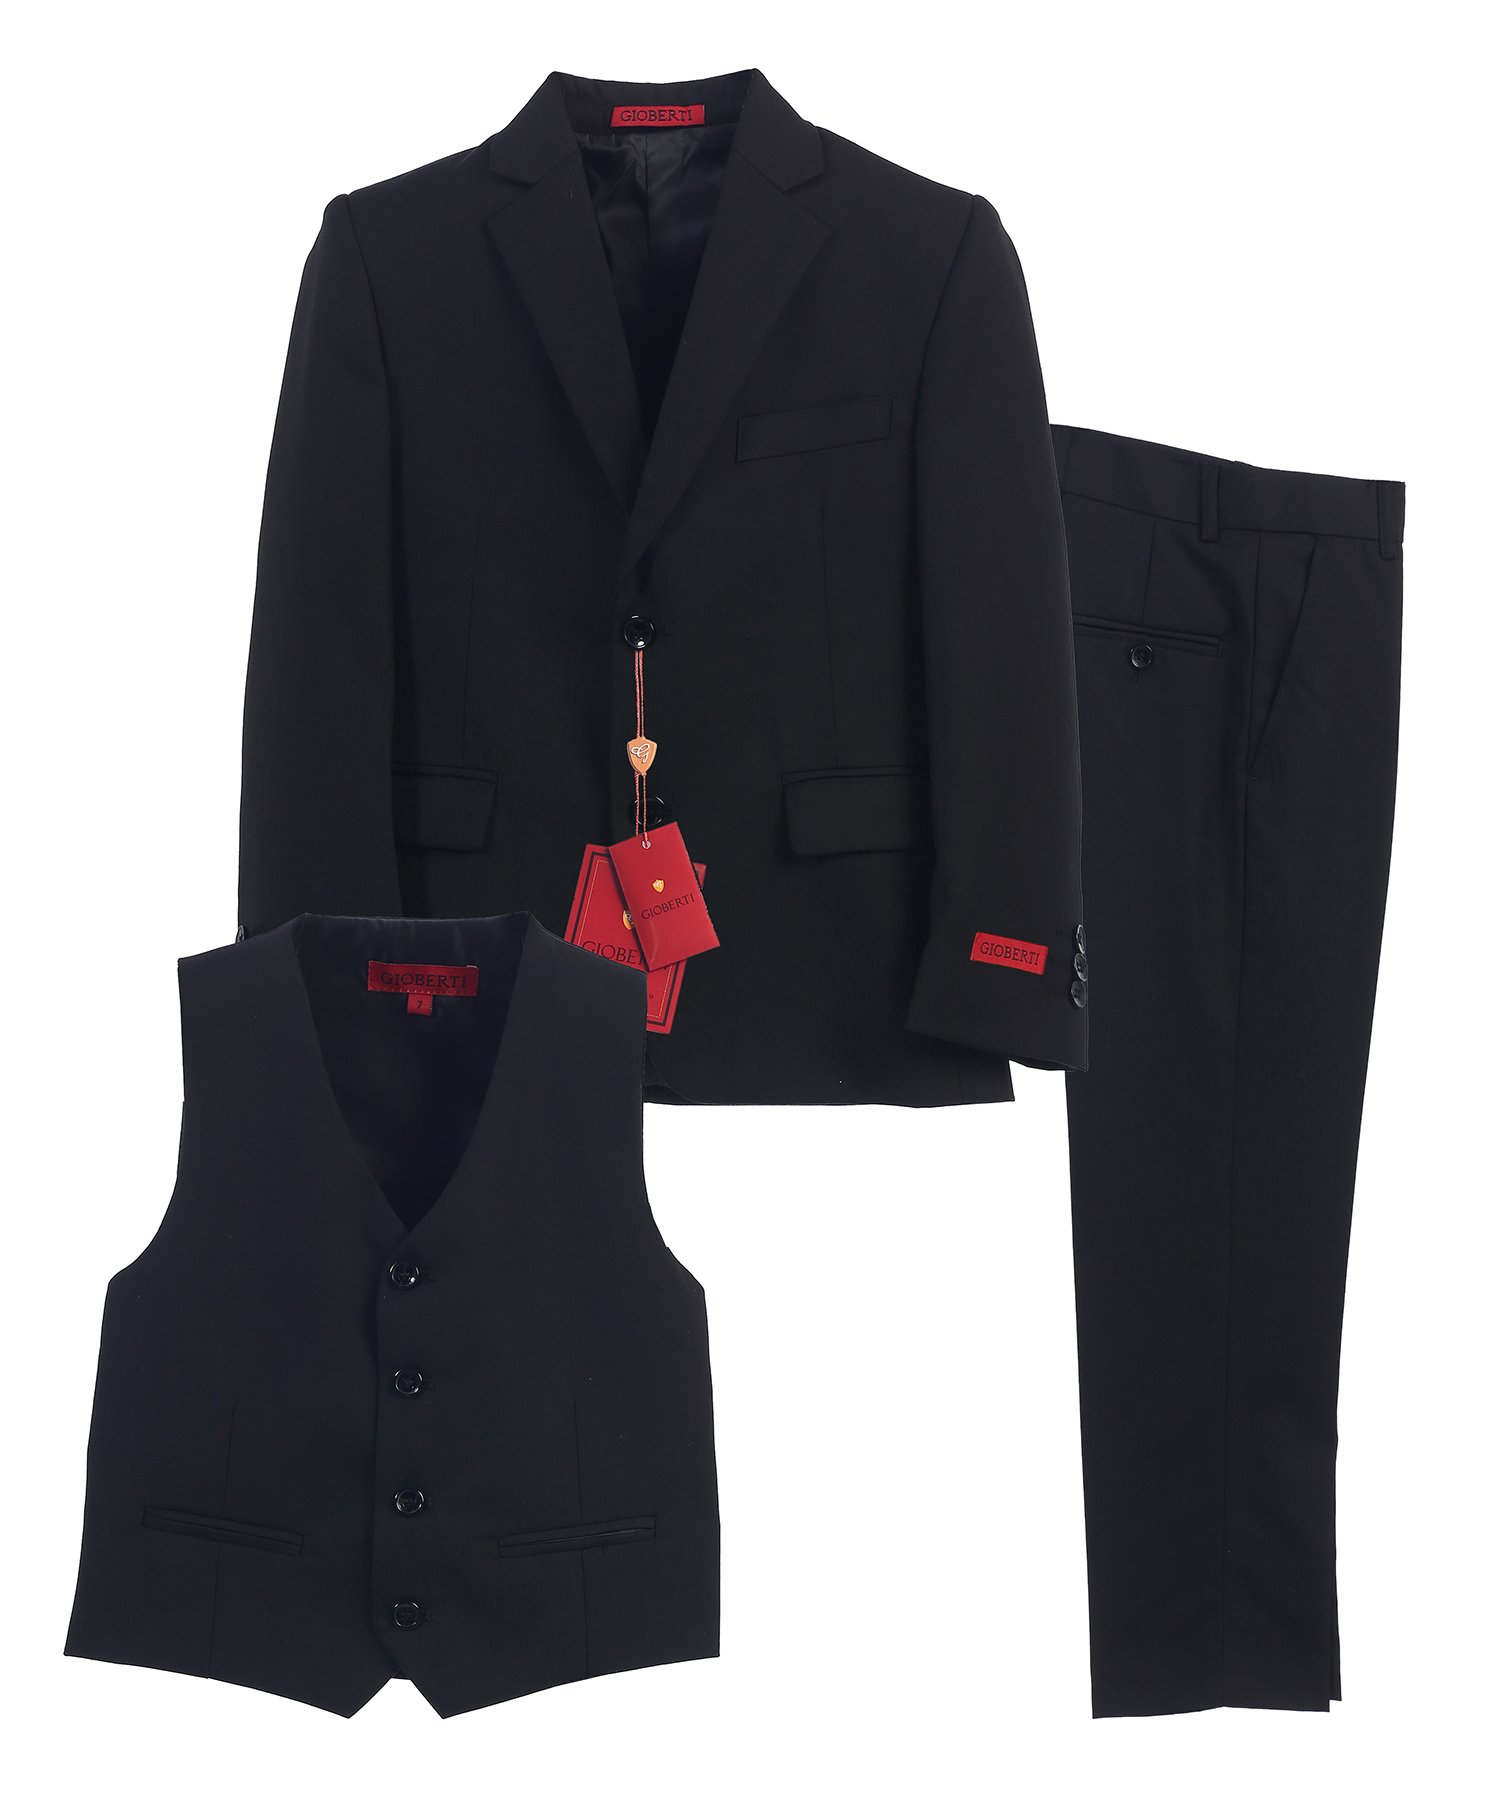 Gioberti Boy's Formal 3 Piece Suit Set, Black, Size 8